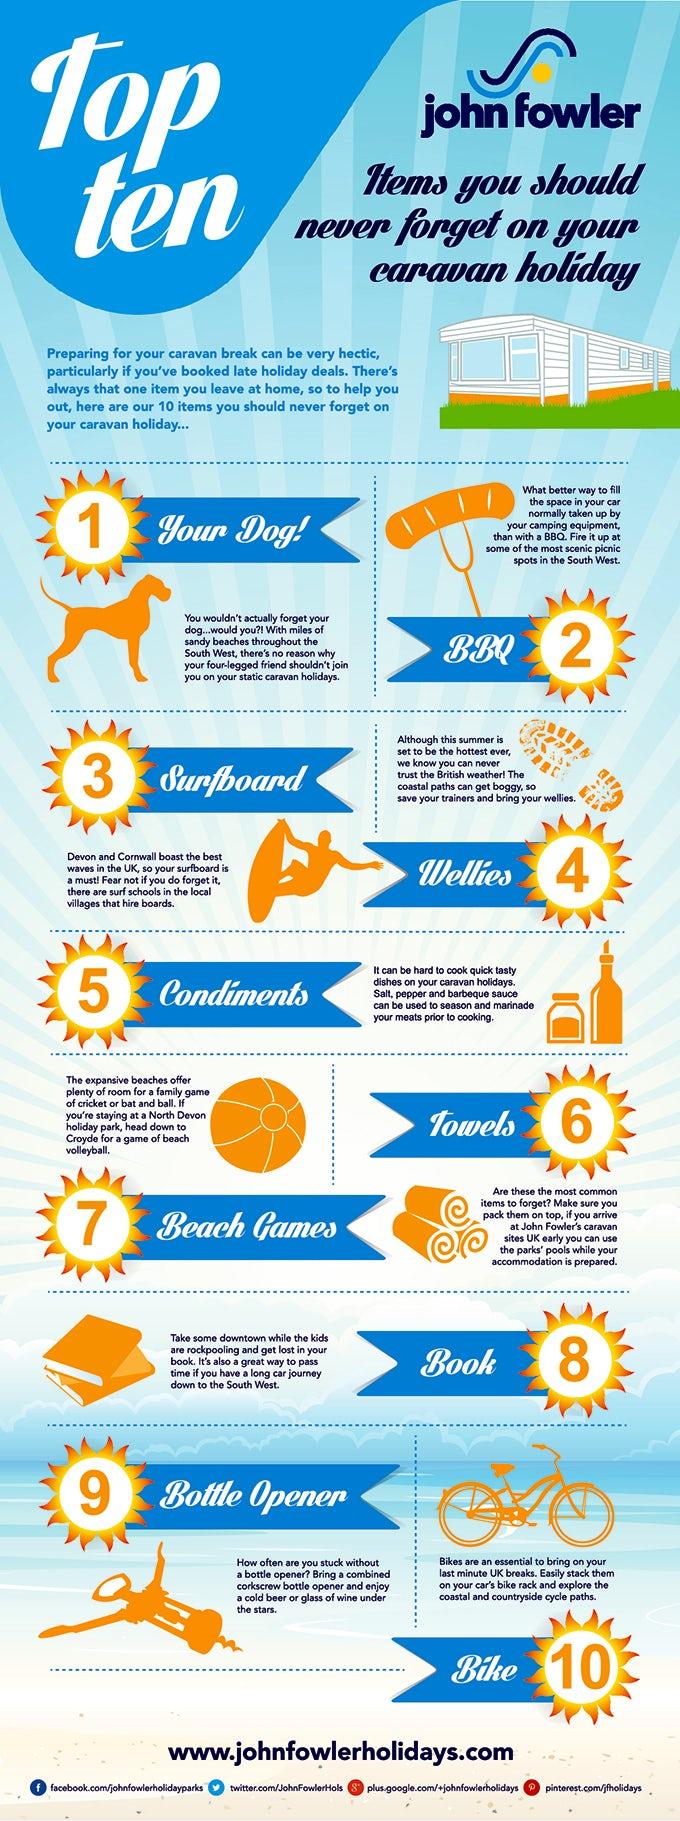 10 Caravan Holiday Essentials | John Fowler Holidays Infographic